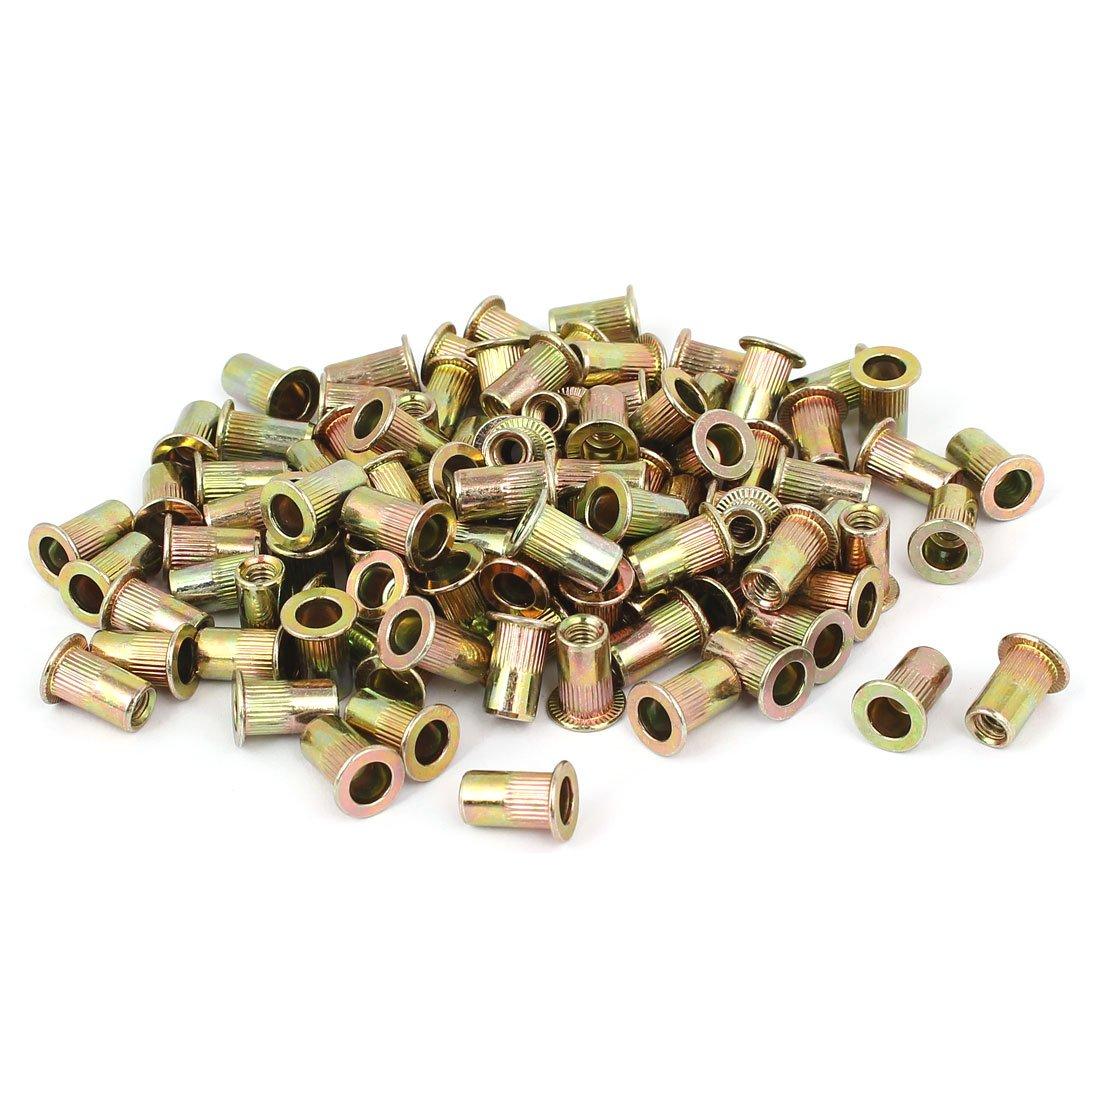 uxcell 8#32 Straight Knurled Rivet Nut Insert Nutsert Bronze Tone 100pcs